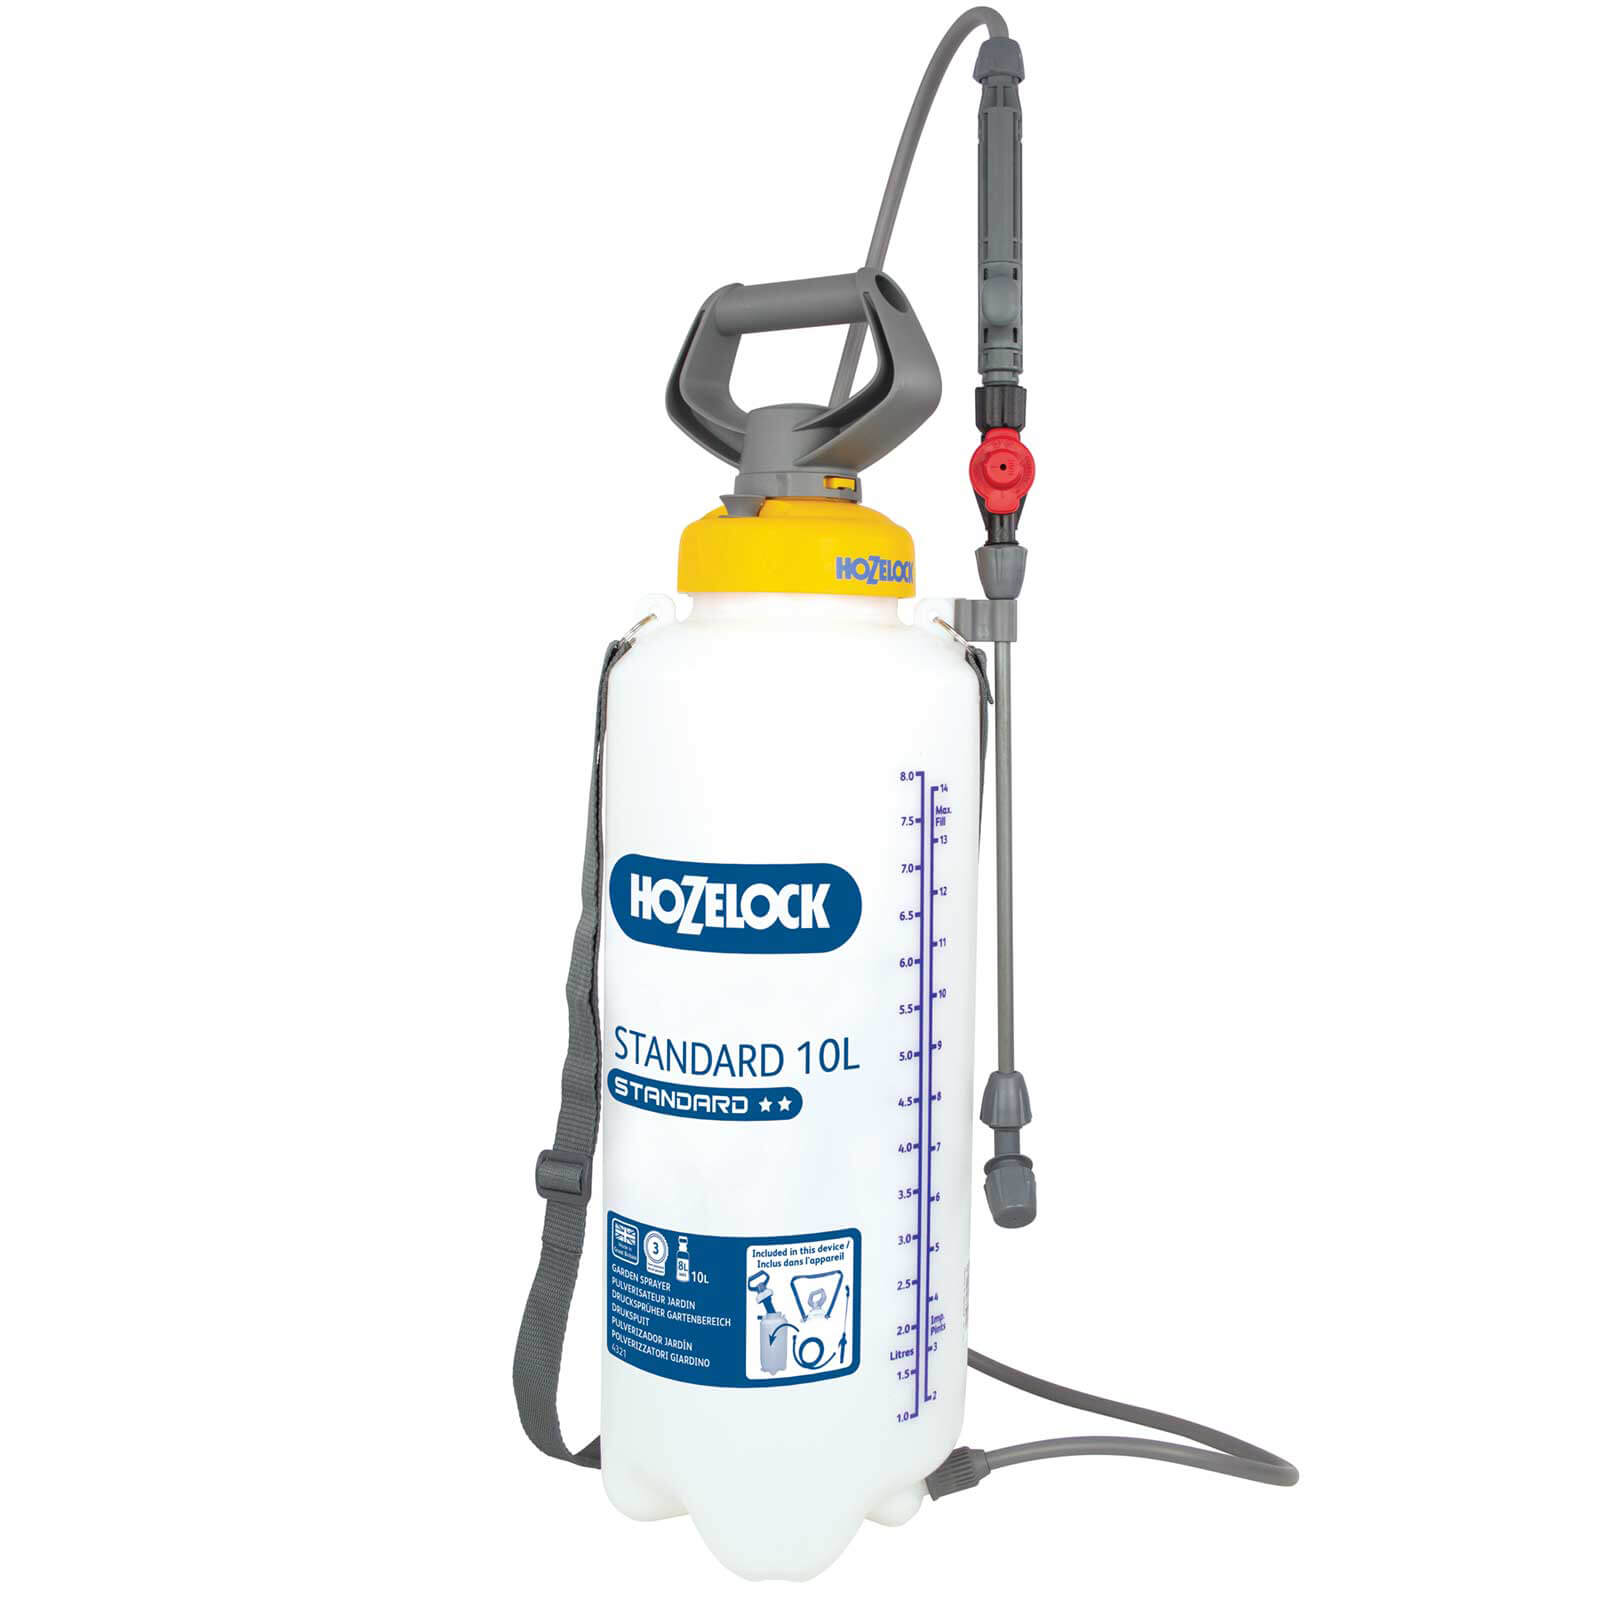 Hozelock STANDARD Water Pressure Sprayer 10l